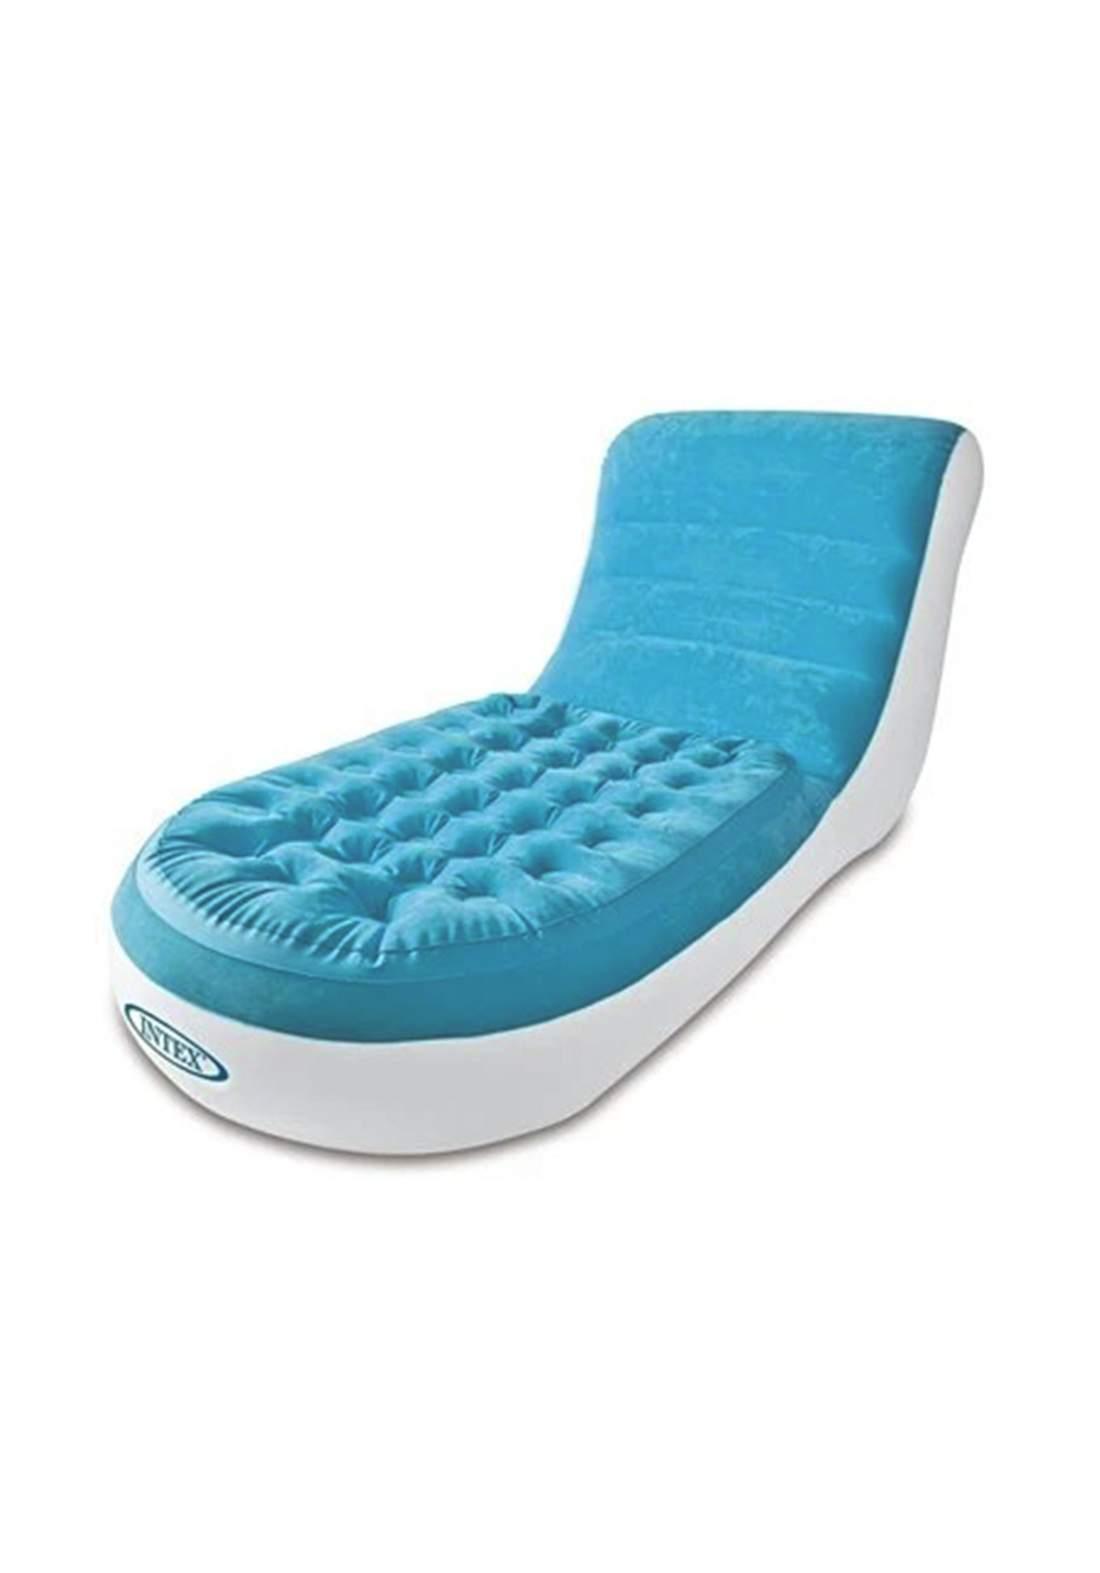 Intex Splash Inflatable Chair for Comfort كرسي استلقاء قابل للنفخ